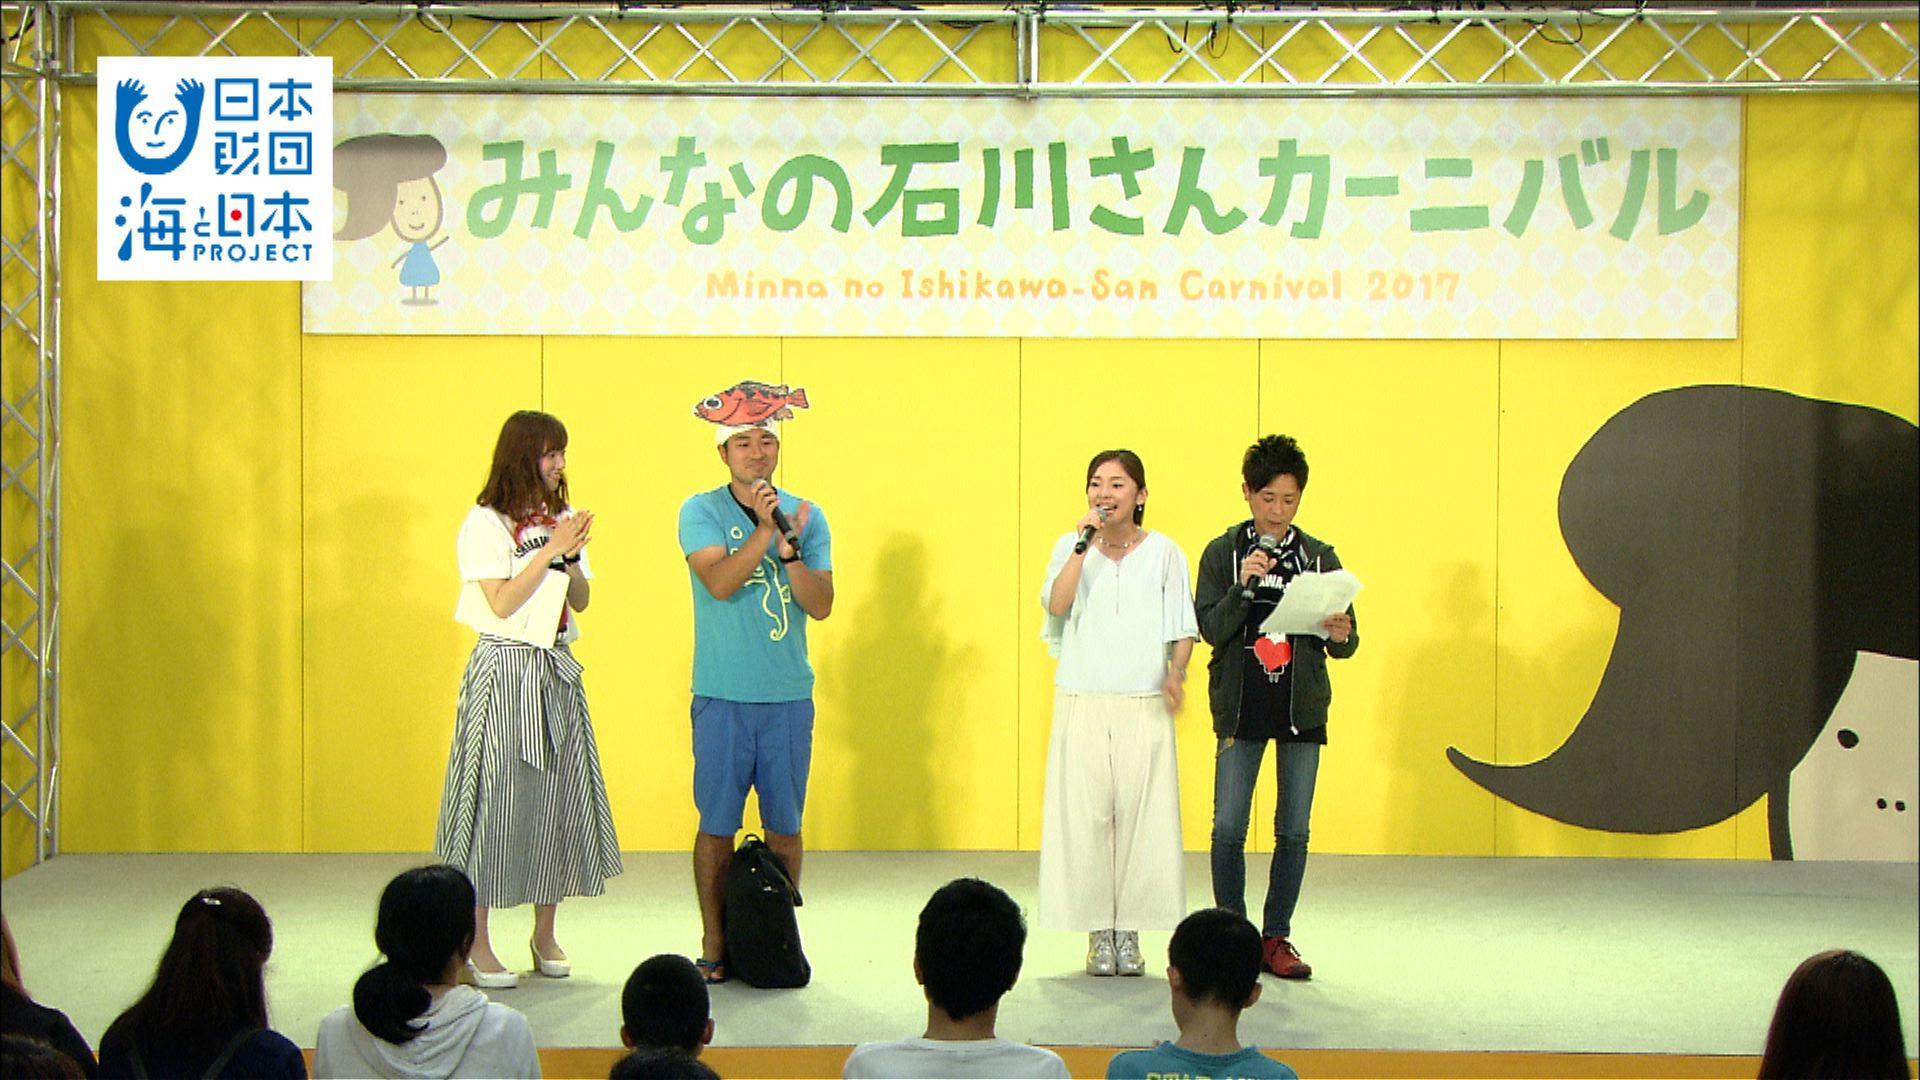 #05_WEB 石川さんカーニバル1